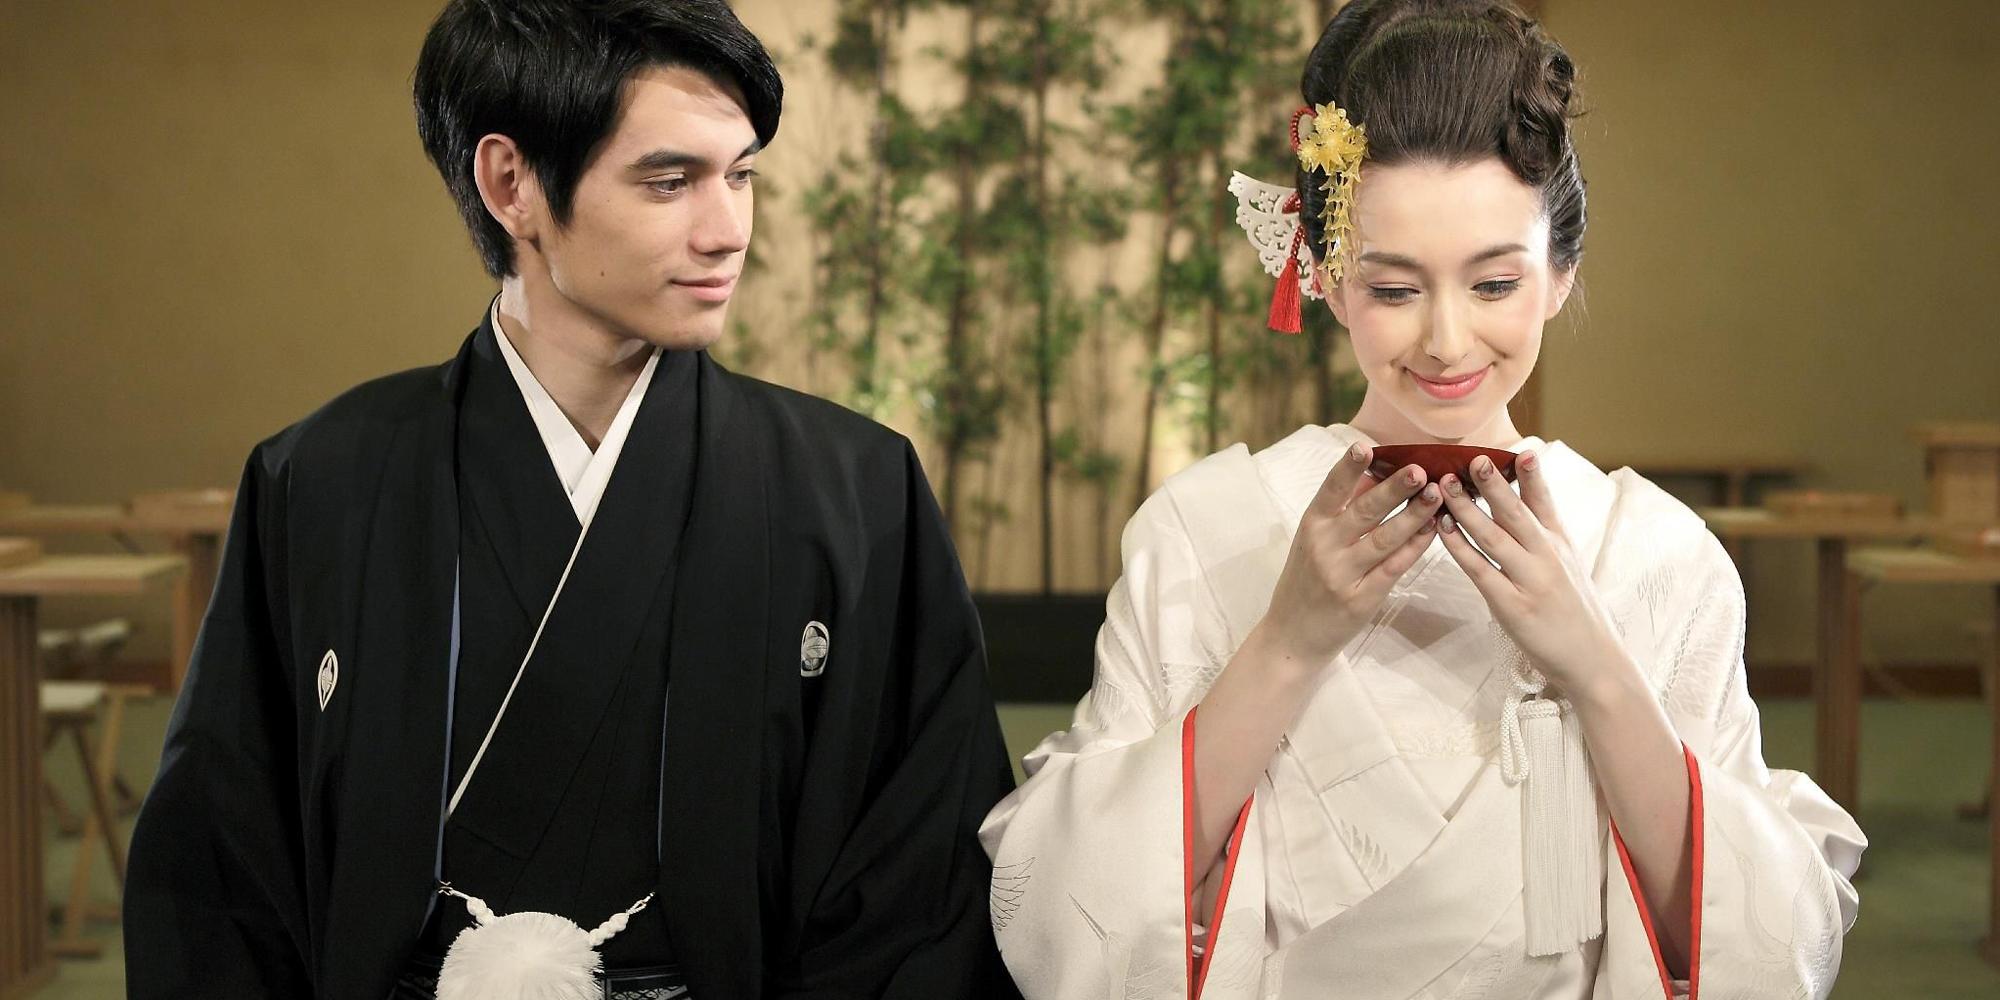 Matrimonio giapponese: tazze con sakè